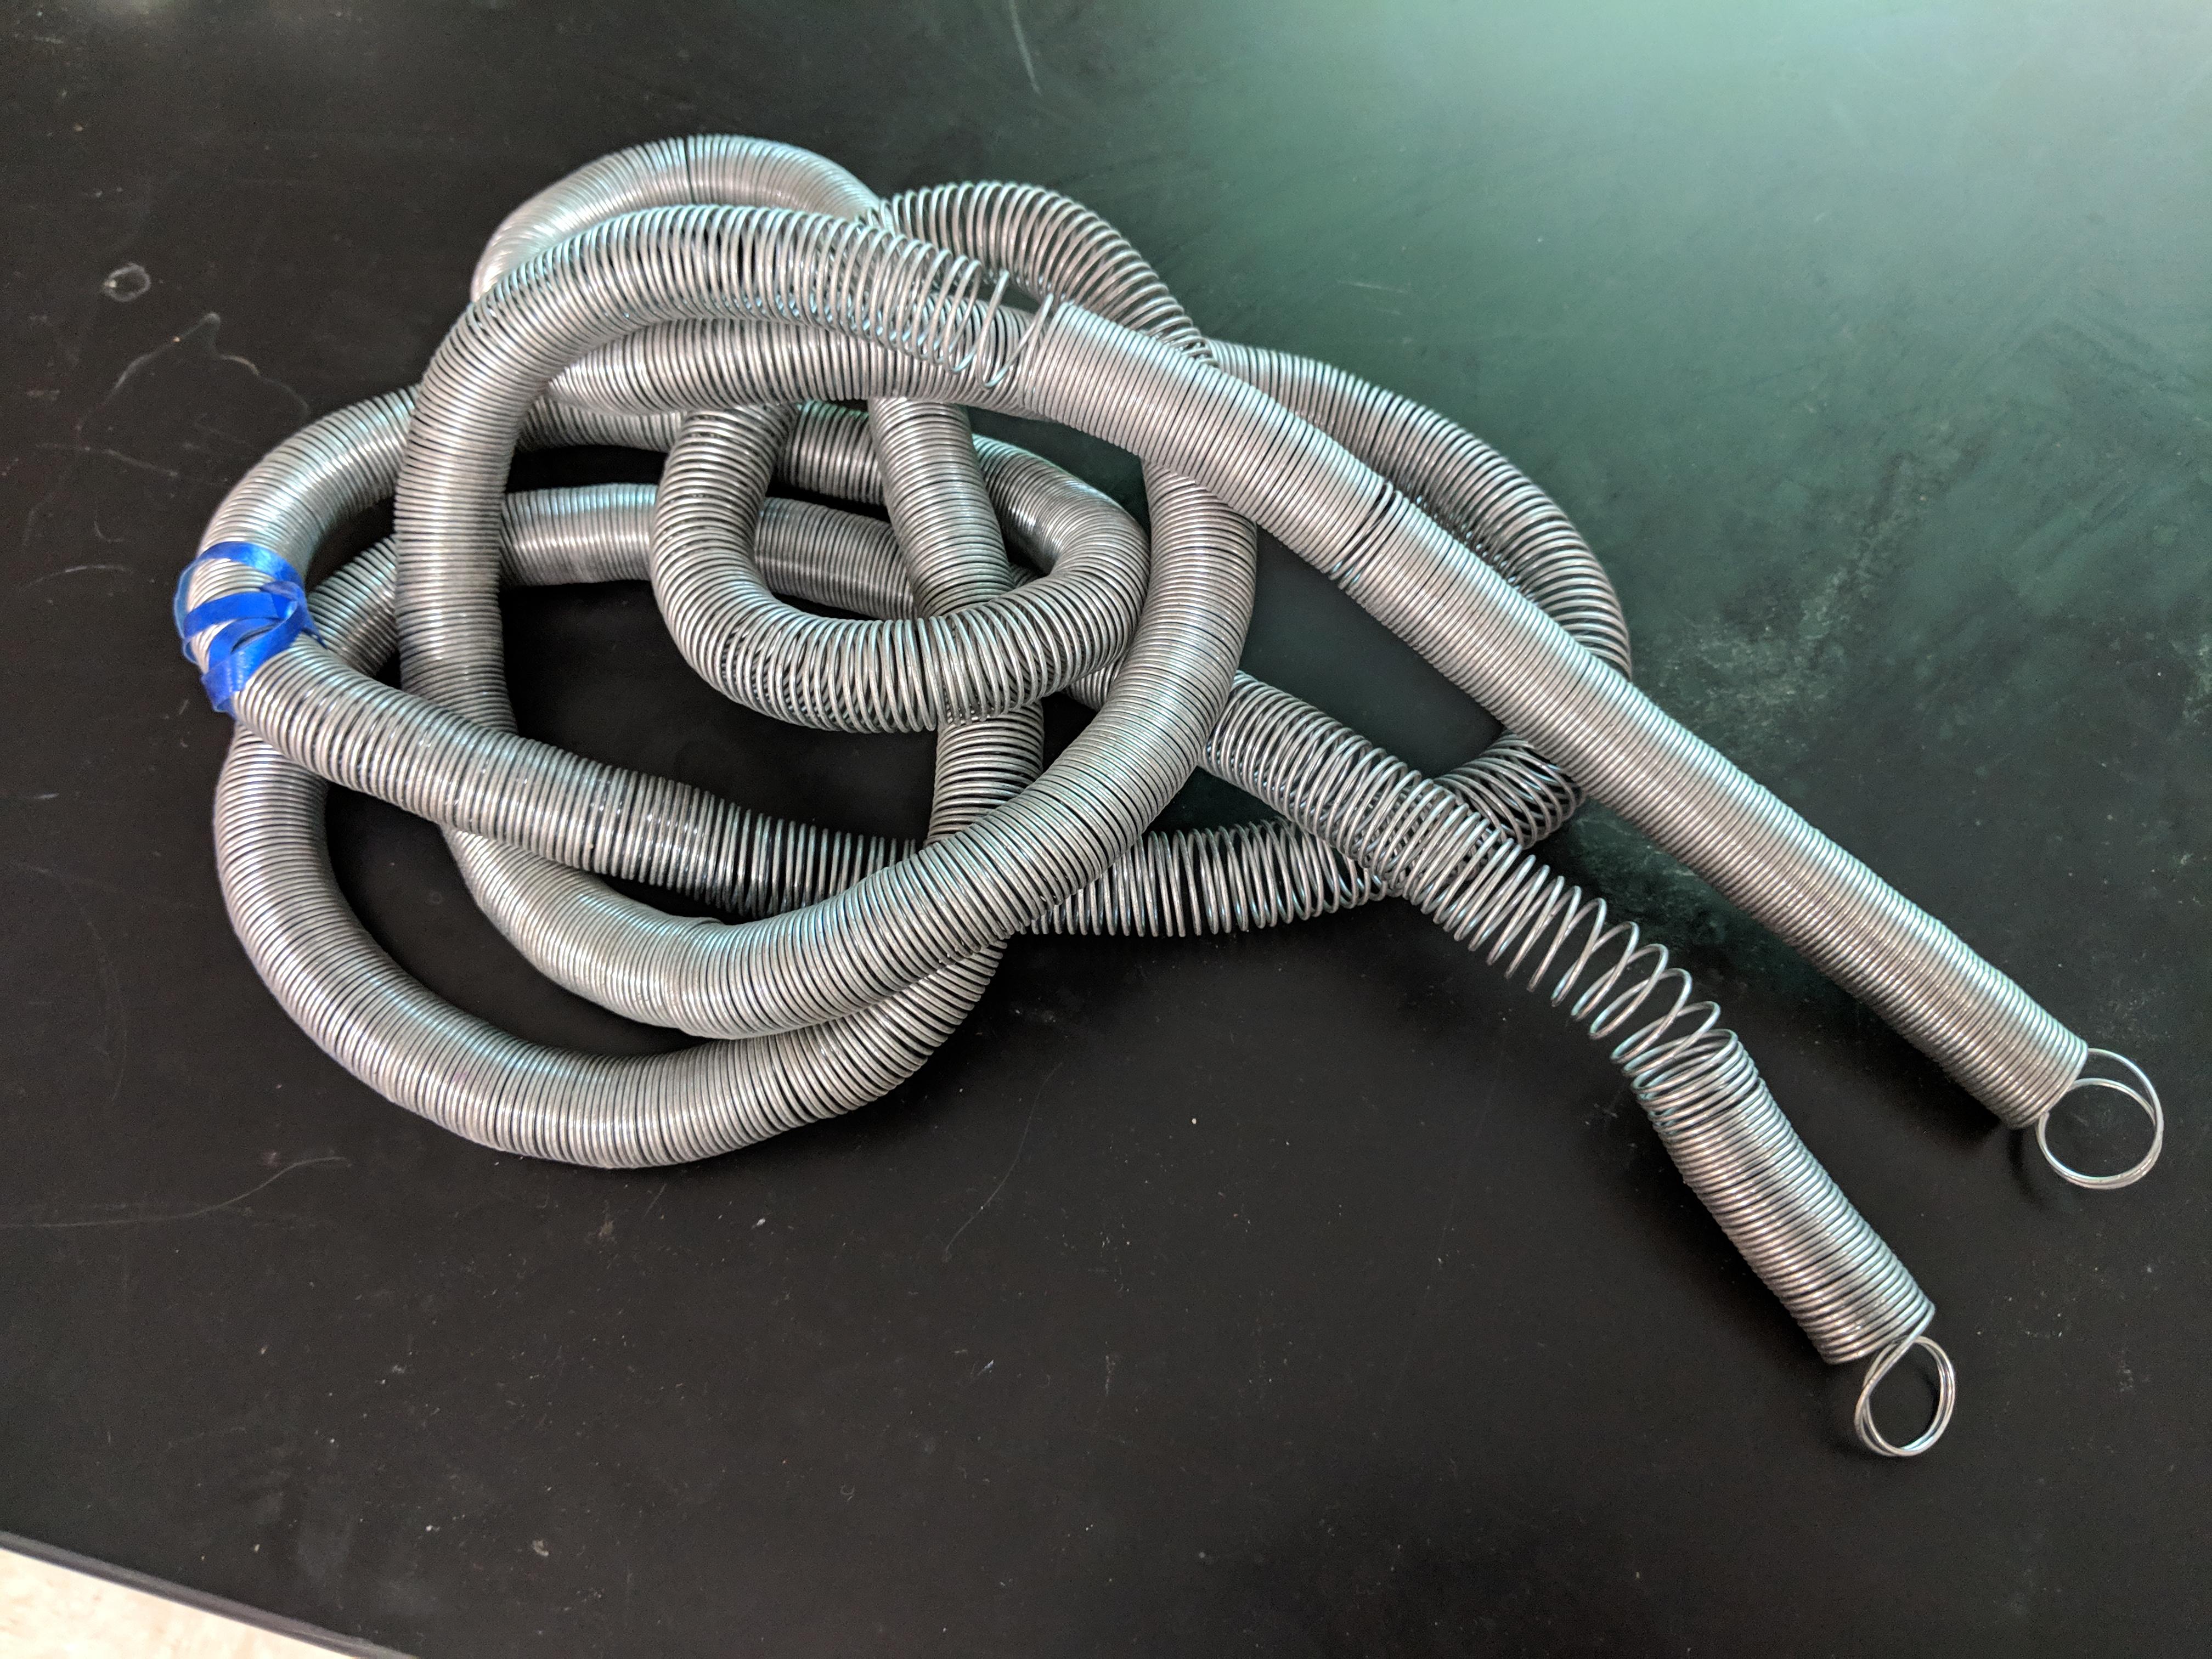 phys snakey.jpg